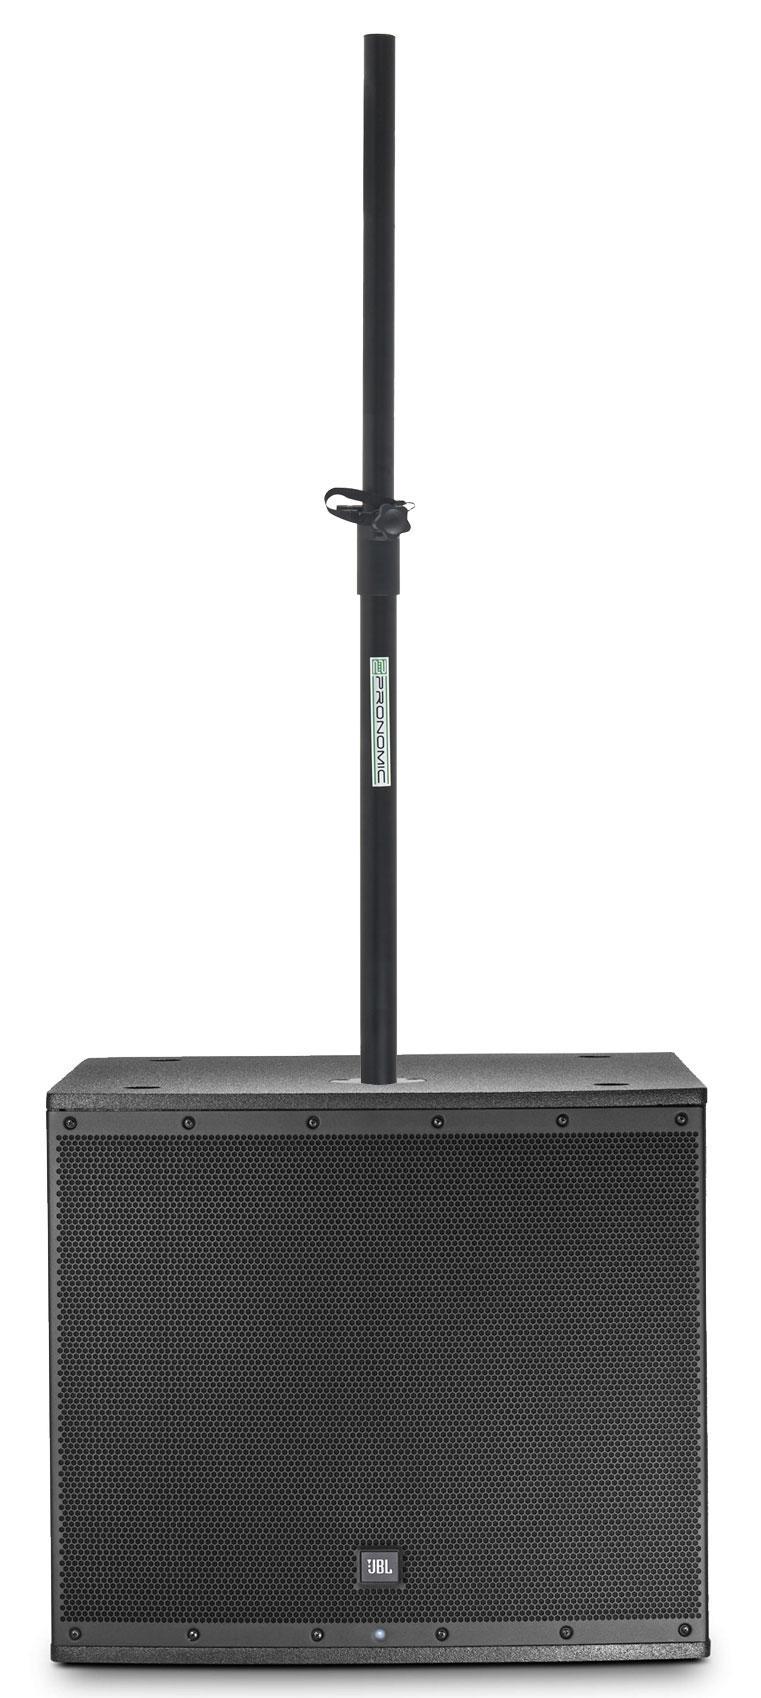 Pasubwoofer - JBL EON618S Set mit Distanzstange - Onlineshop Musikhaus Kirstein